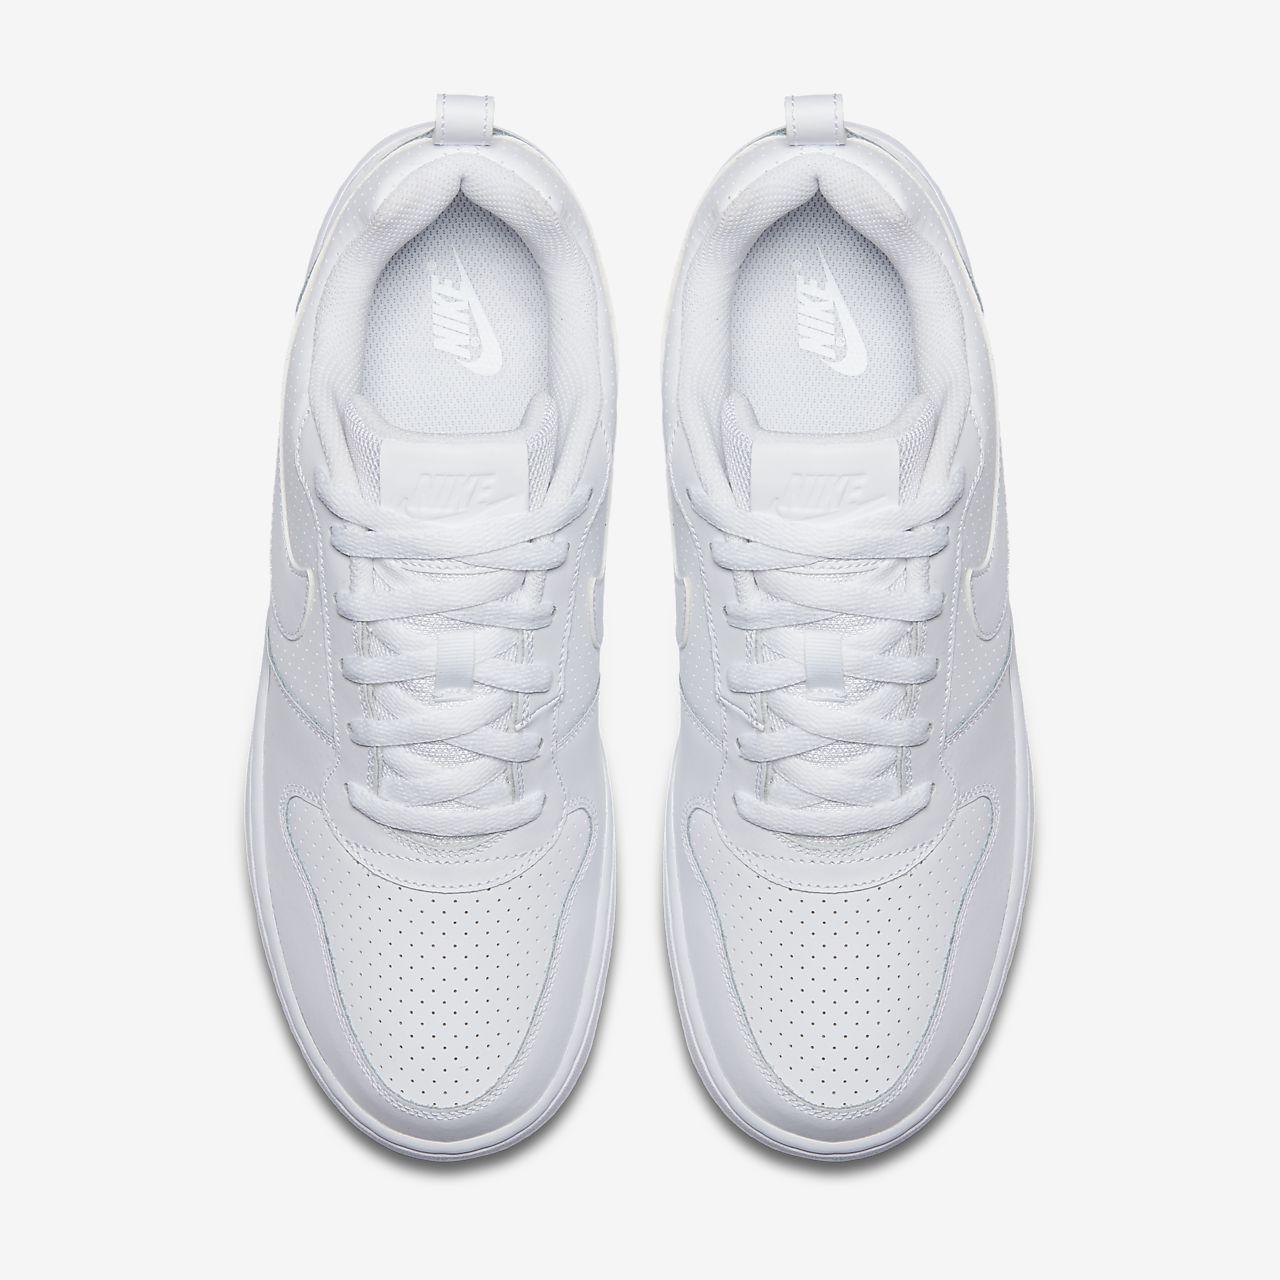 cheap for discount d76f4 8dbaa ... Chaussure NikeCourt Borough Low pour Homme